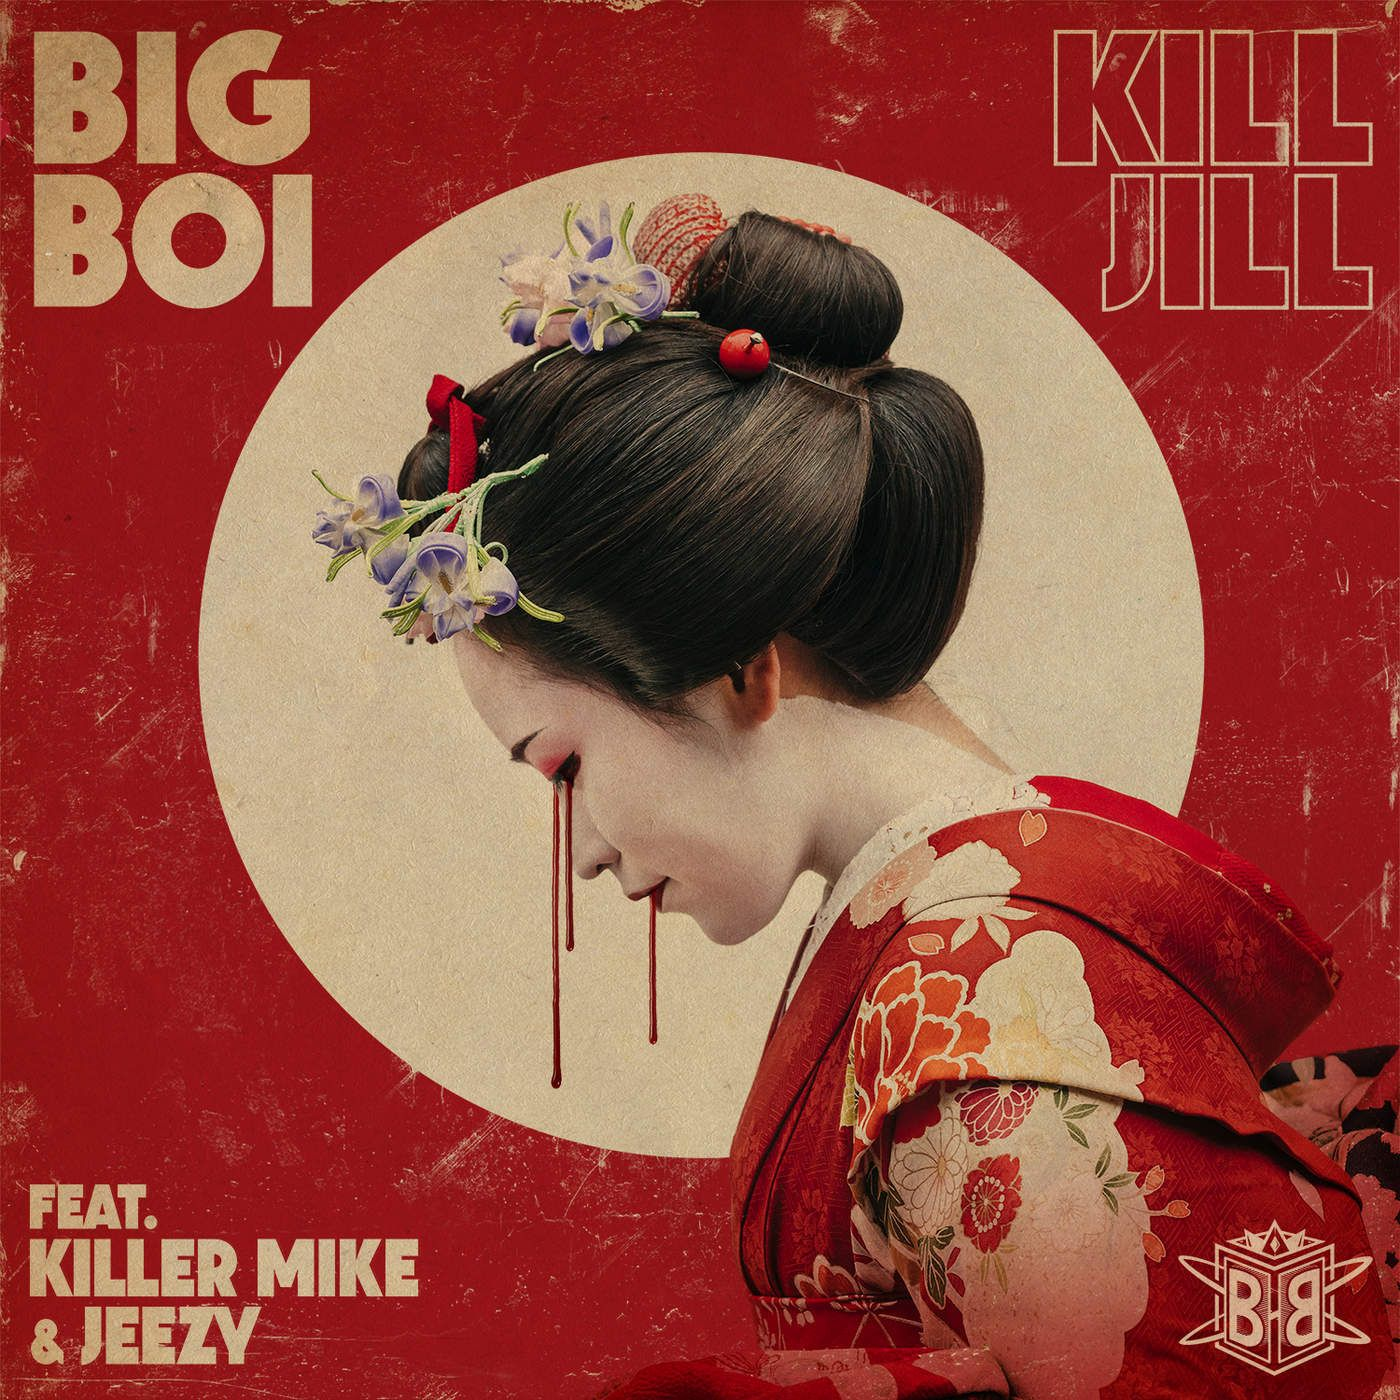 Big Boi Kill Jill Cover